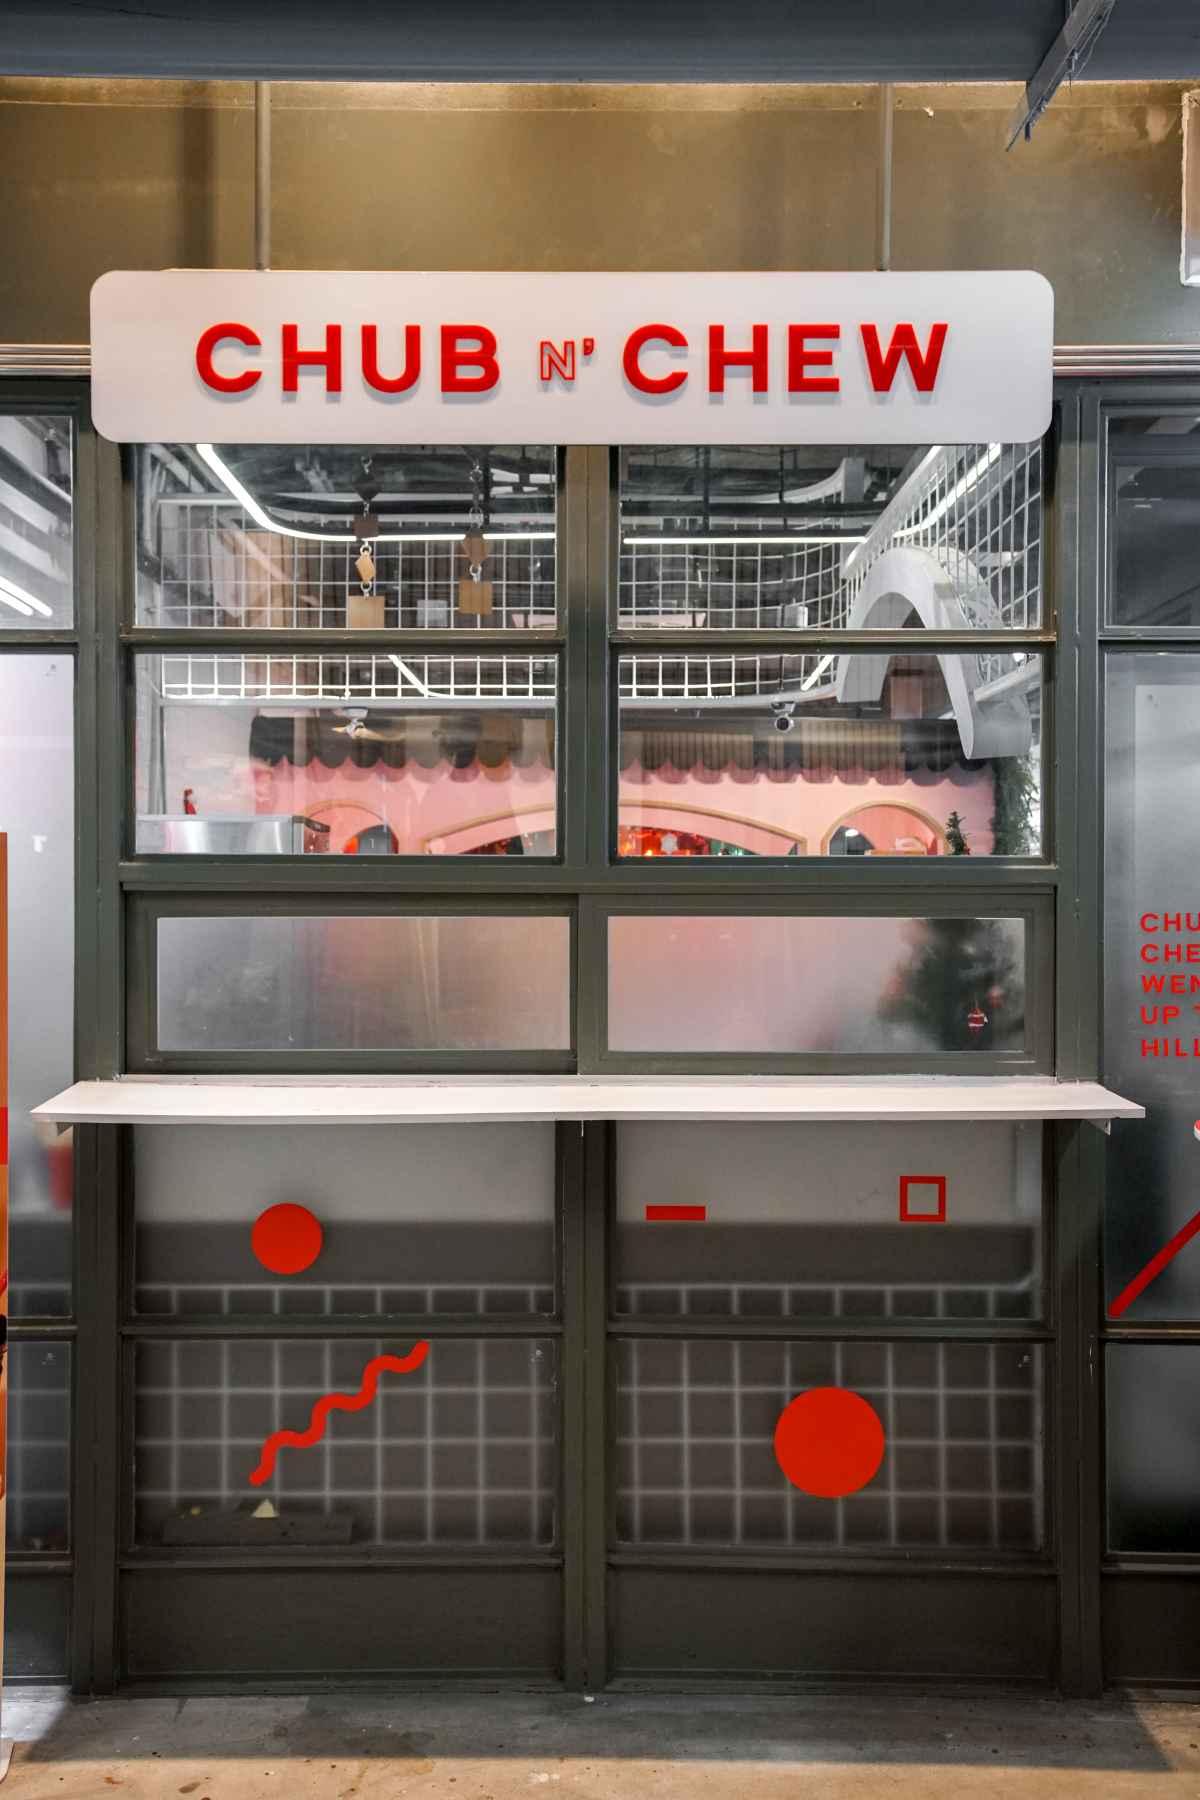 Chub N' Chew